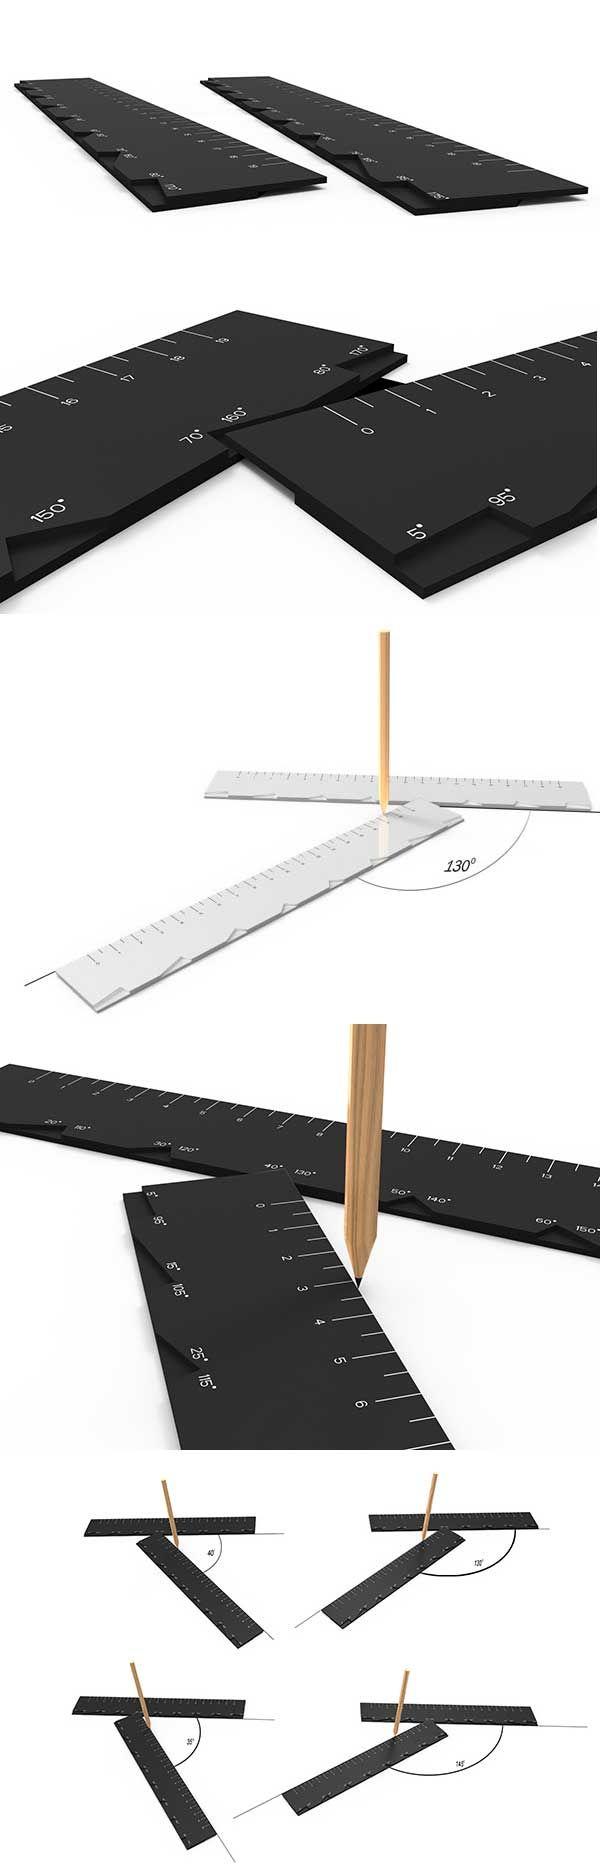 #Creative# ruler design: ZigZag